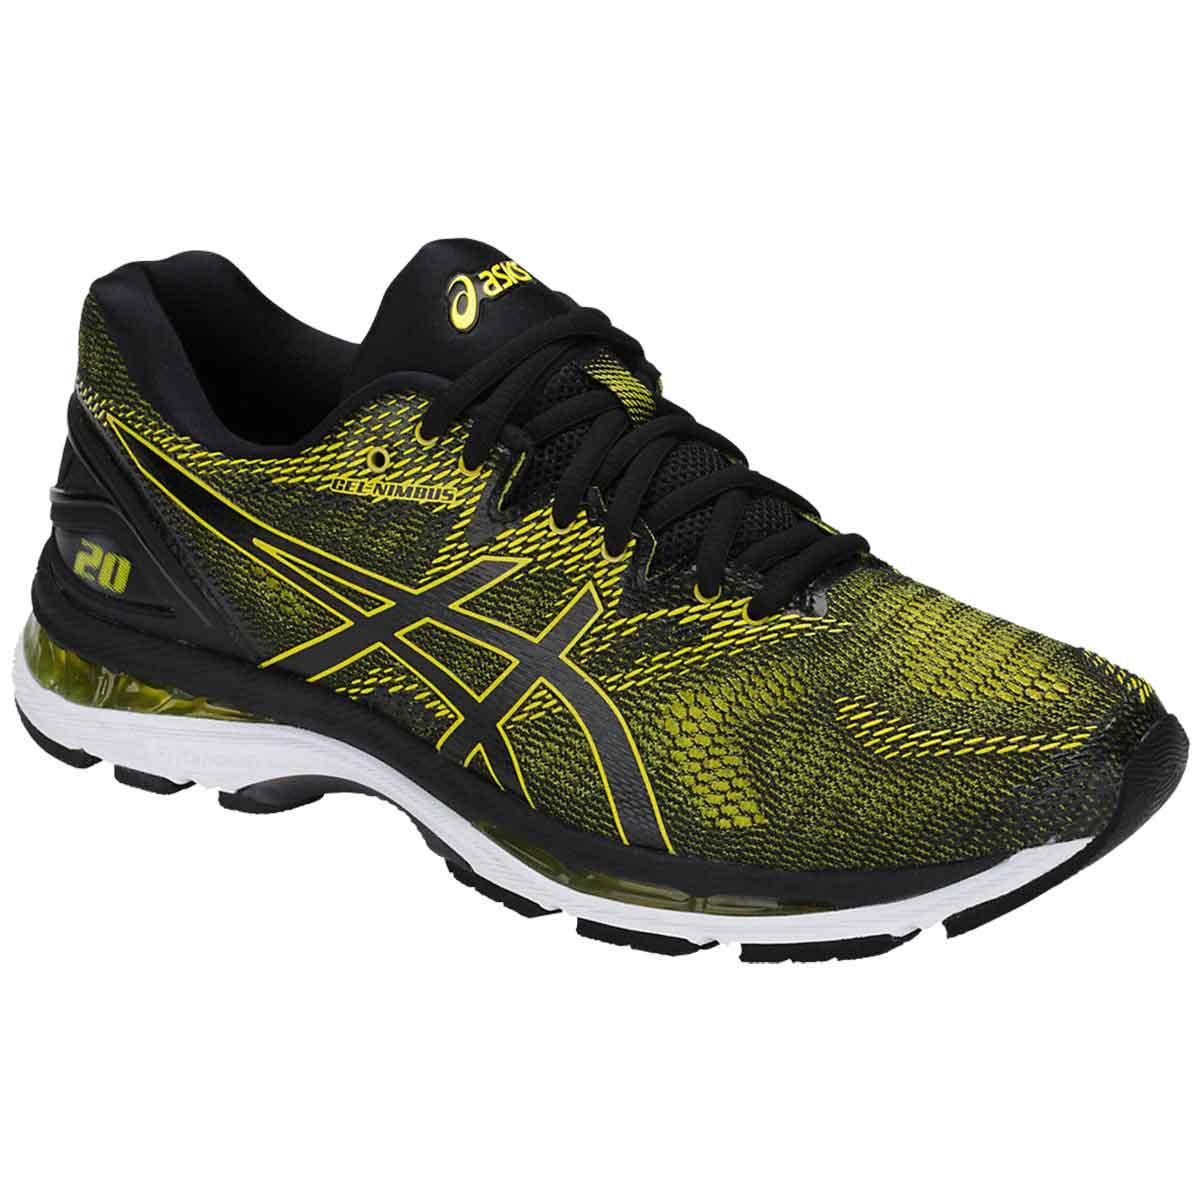 variousstyles buy complimentary shipping Asics Gel-Nimbus 20 Running Shoes (Sulphur/Black/White)